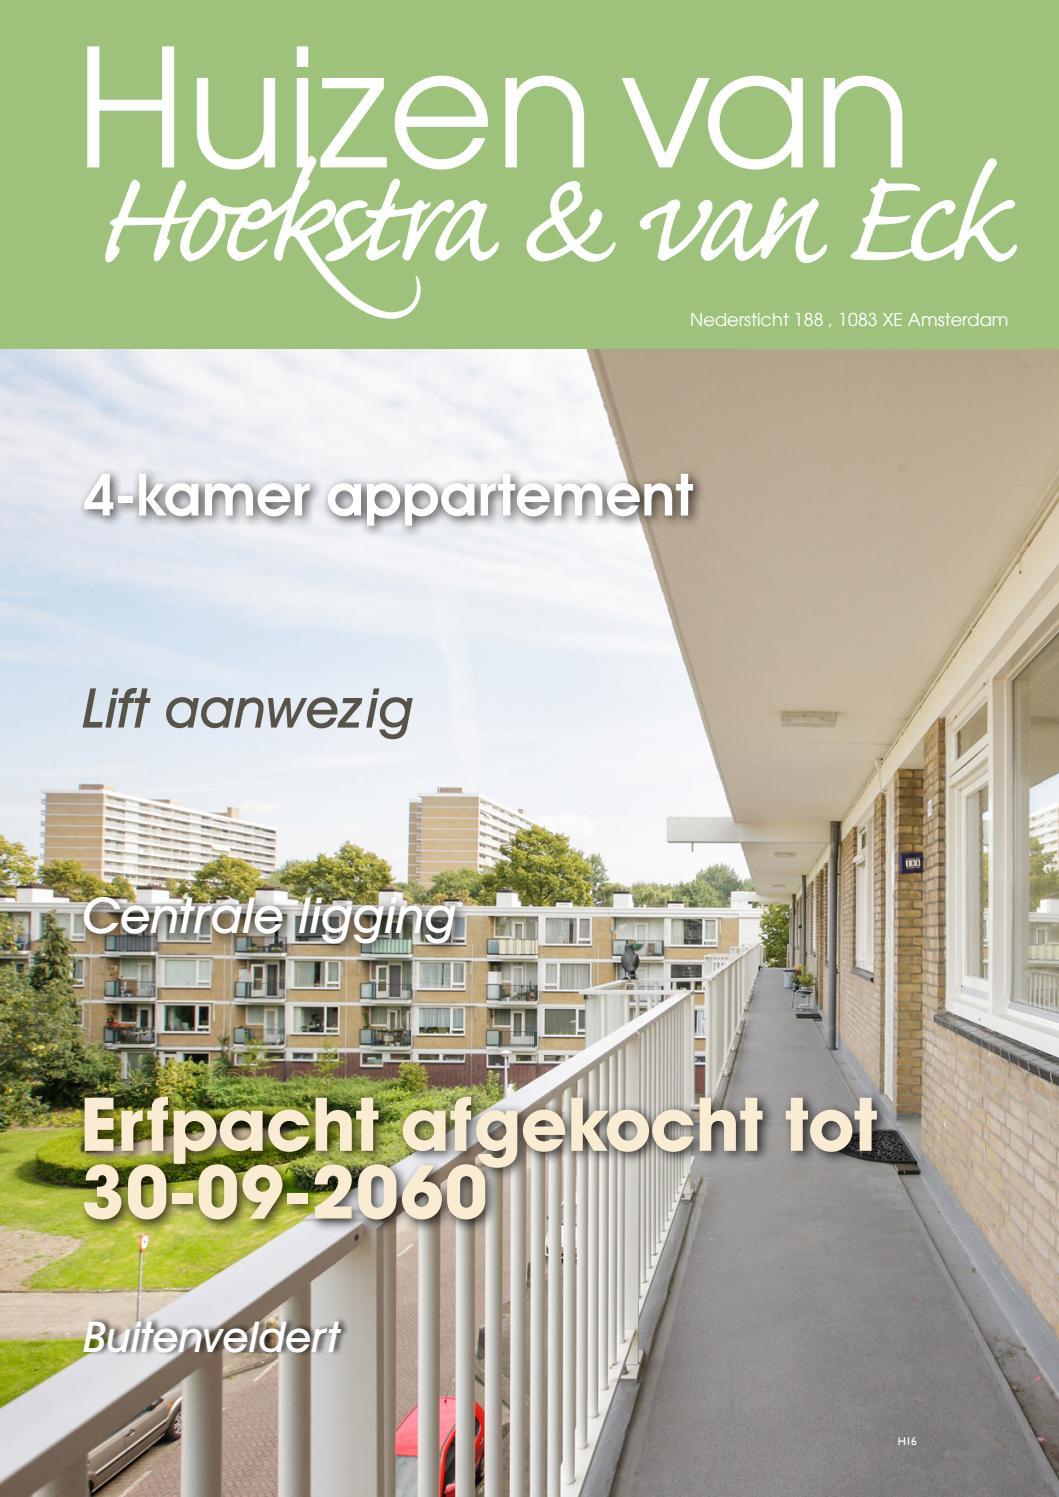 Amsterdam, Nedersticht, 188 by Hoekstra en van Eck Makelaars - méér ...